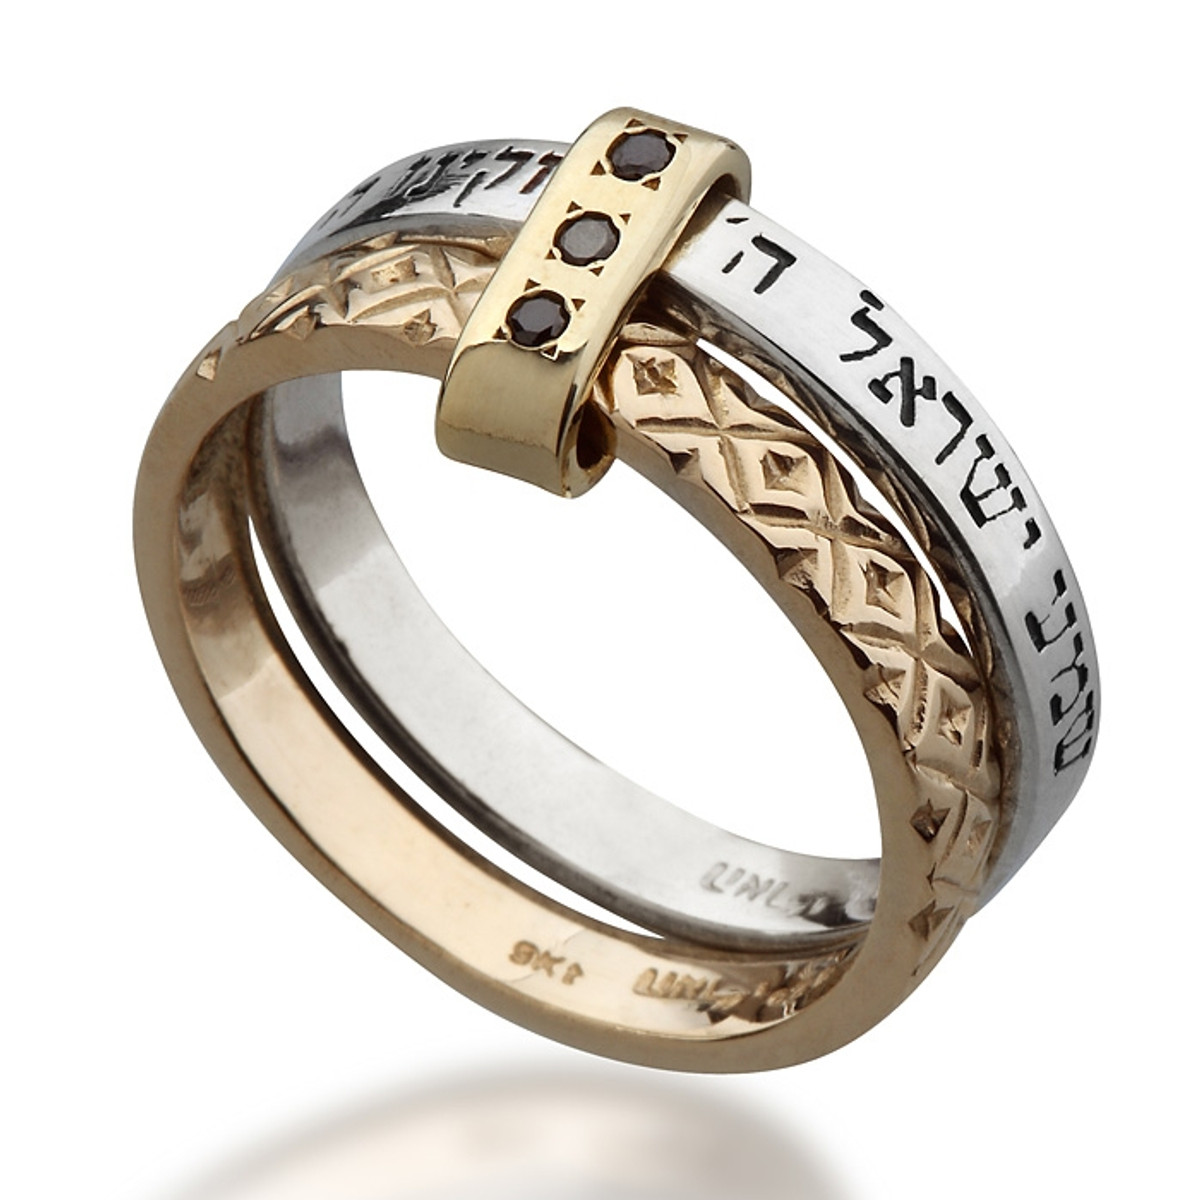 Shema Yisrael Silver & Gold Ring by Haari